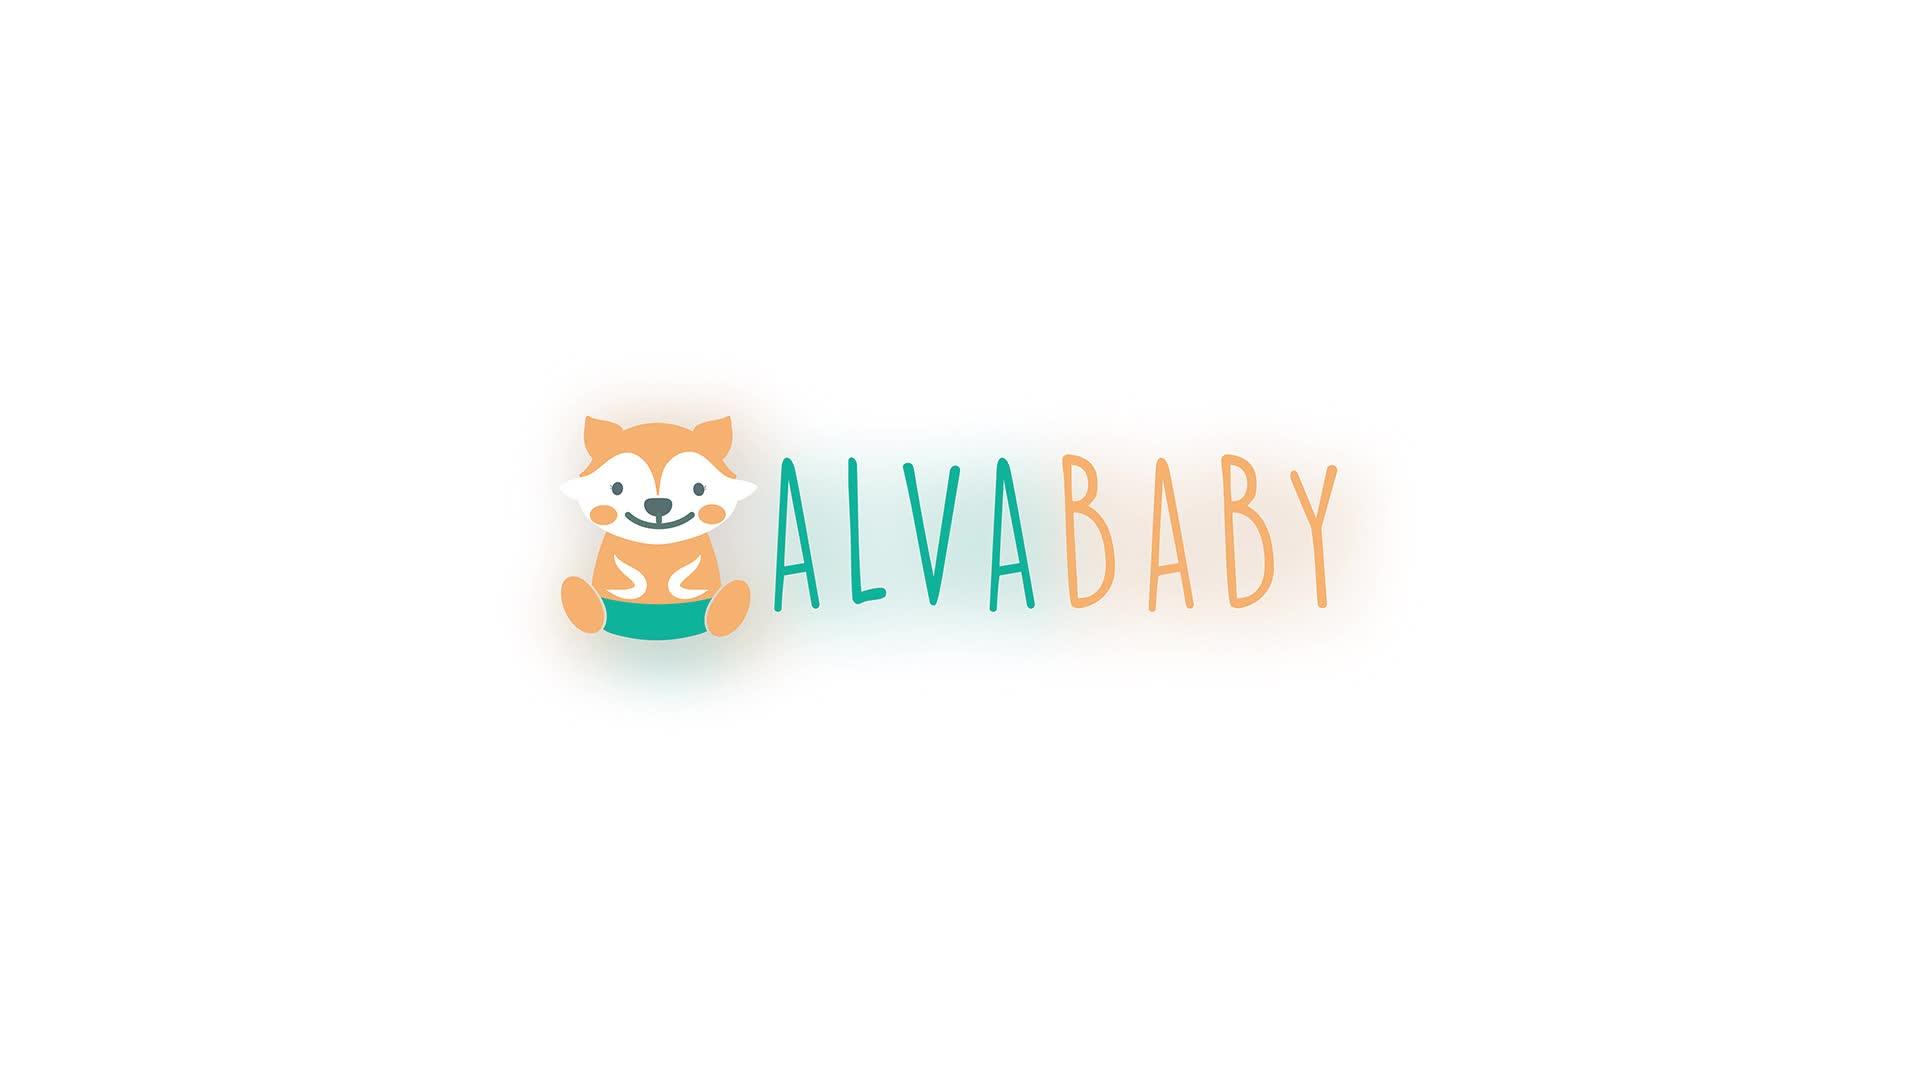 ALVABABY डिजिटल तैनात बच्चे कपड़ा डायपर पुन: प्रयोज्य मुद्रित कपड़ा डायपर लंगोट इच्छित मुद्रण स्वीकार्य